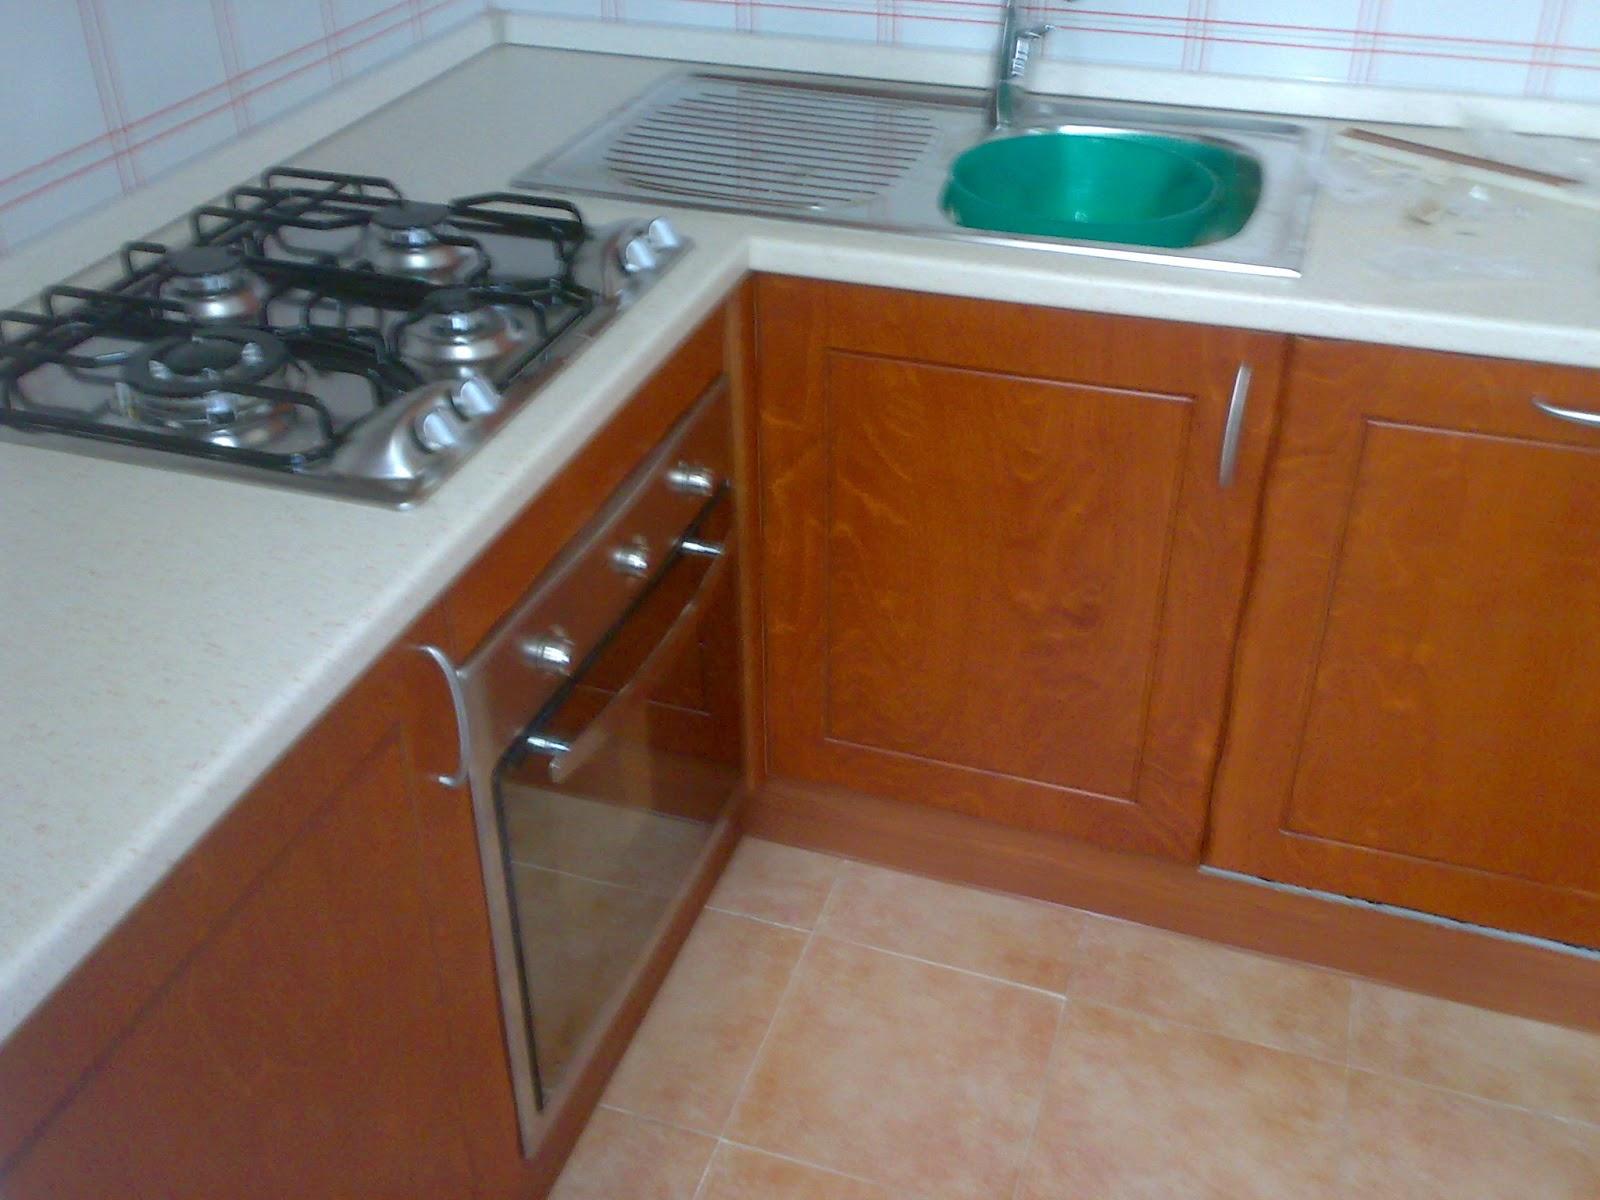 Costruire Piano Cucina In Legno : Top cucina fai da te legno costruire mobile cucina fai da te